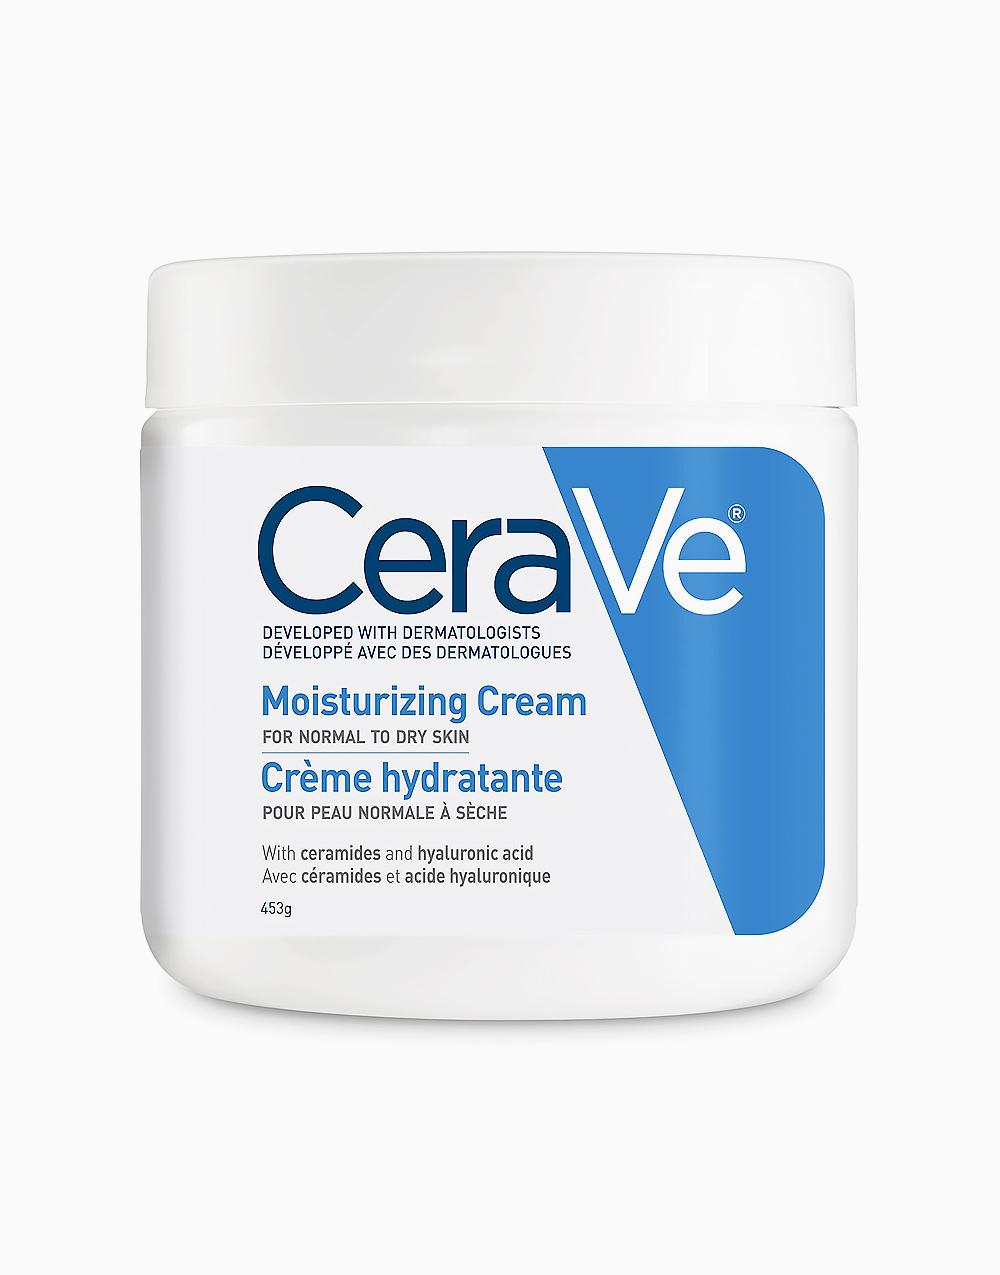 Moisturizing Cream (453g) by CeraVe